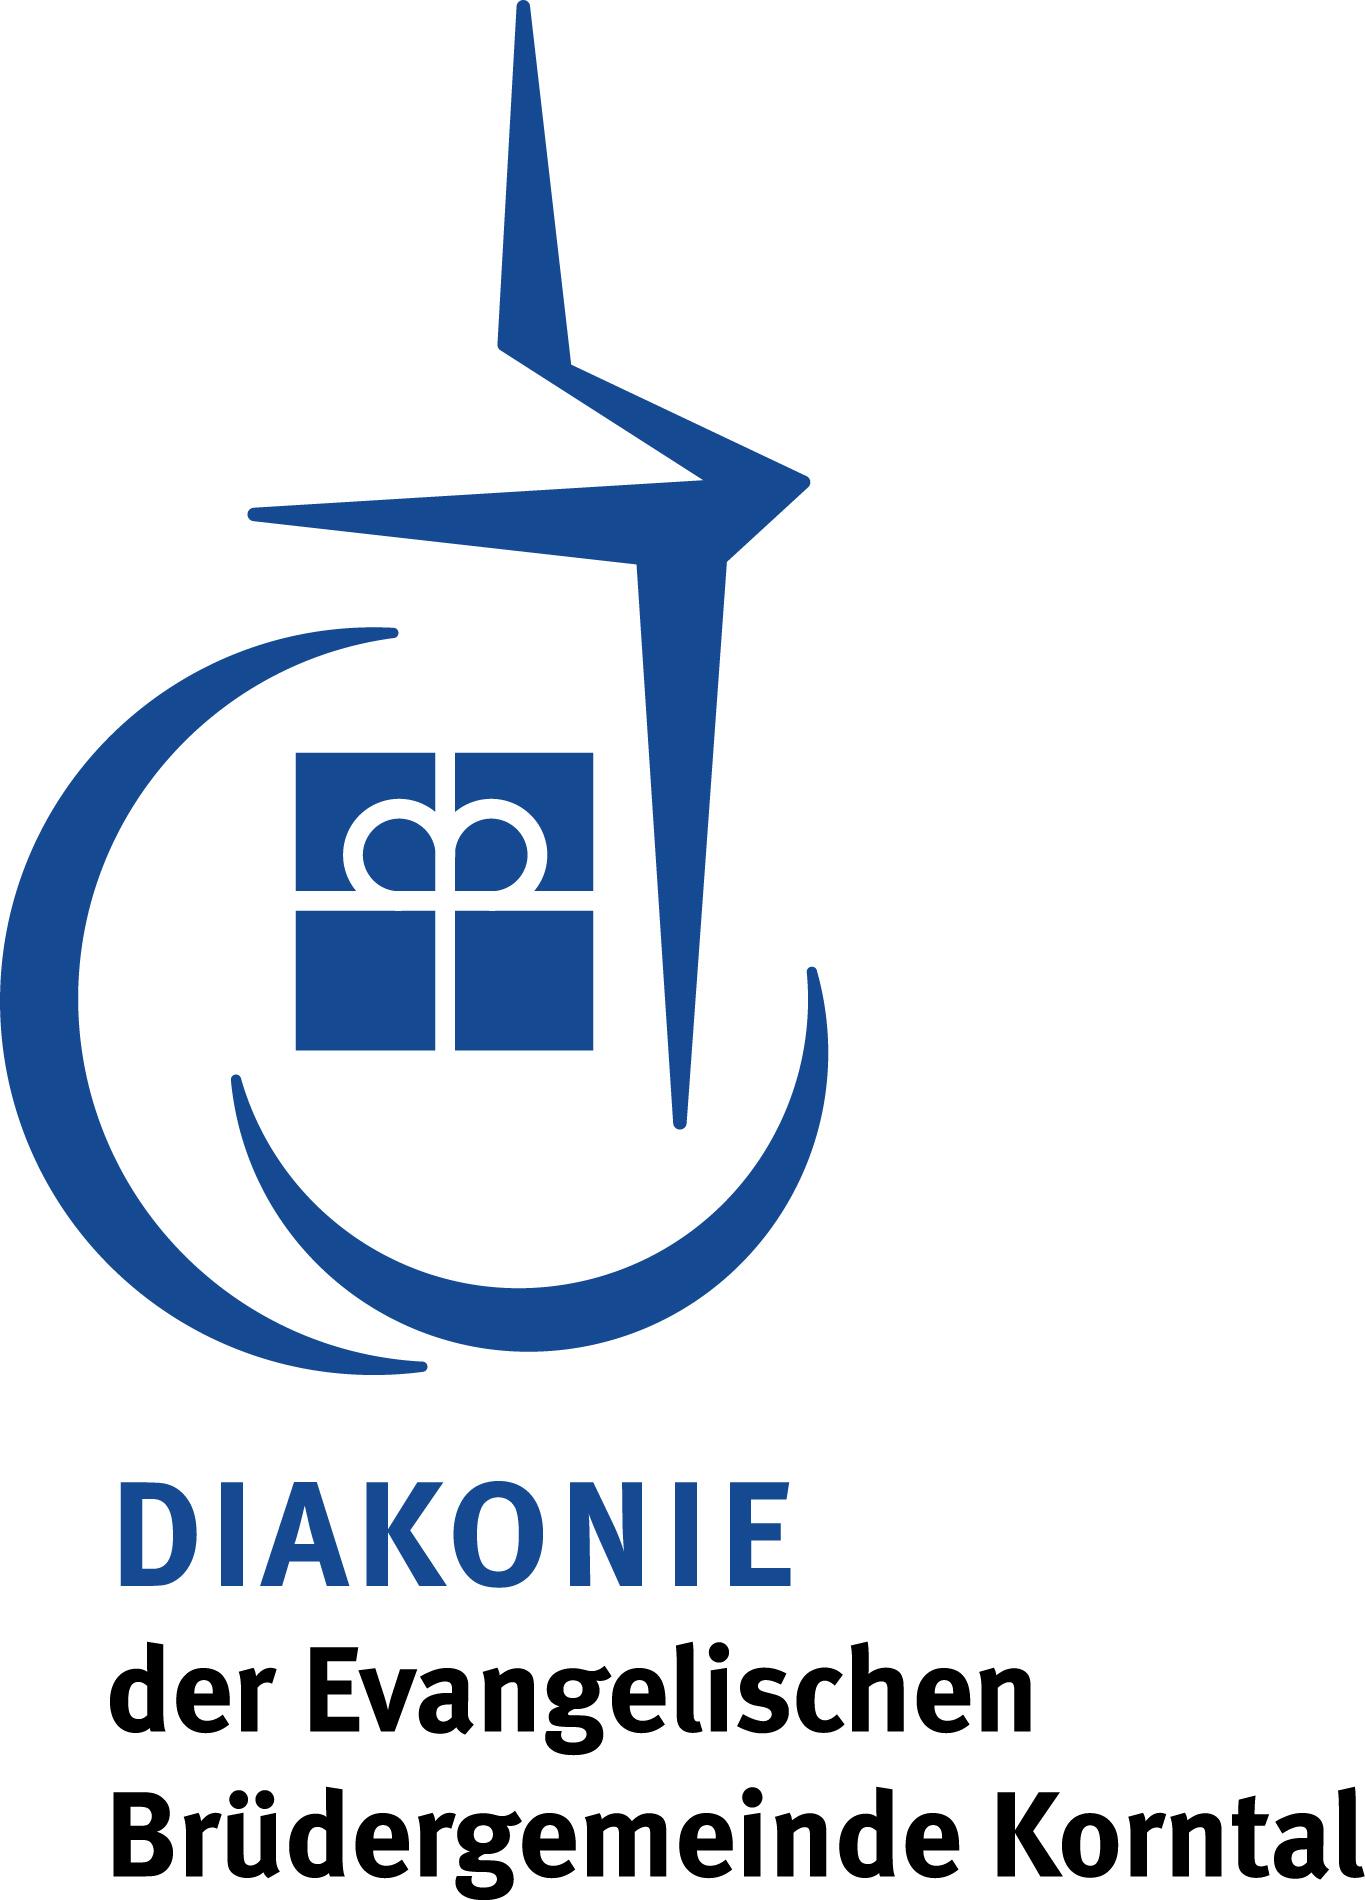 Logo: Diakonie der Ev. Brüdergemeinde Korntal -Jugendhilfe Korntal stationär